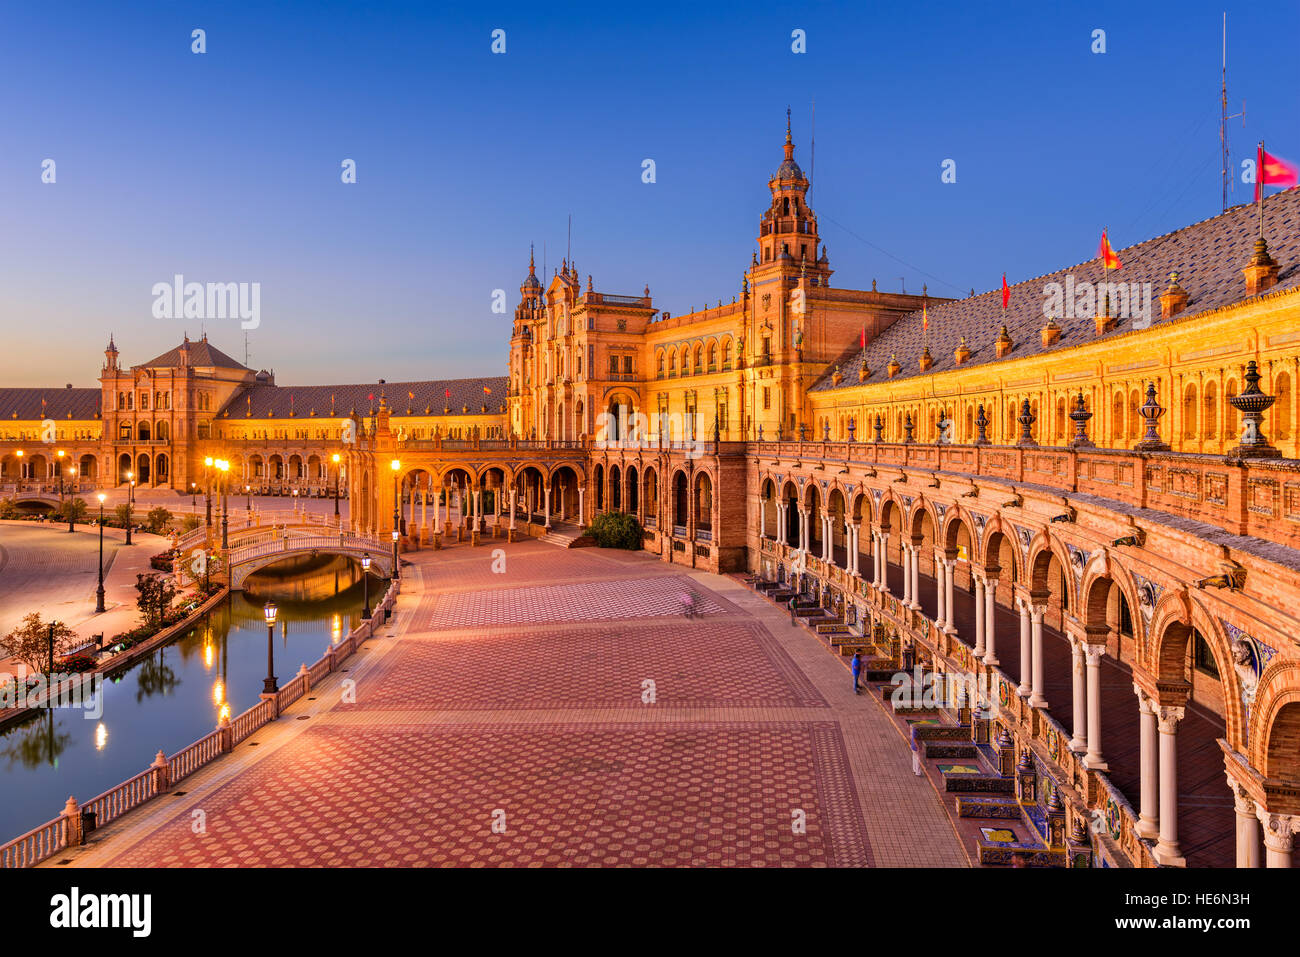 Sevilla, Spanien am spanischen Platz. Stockbild